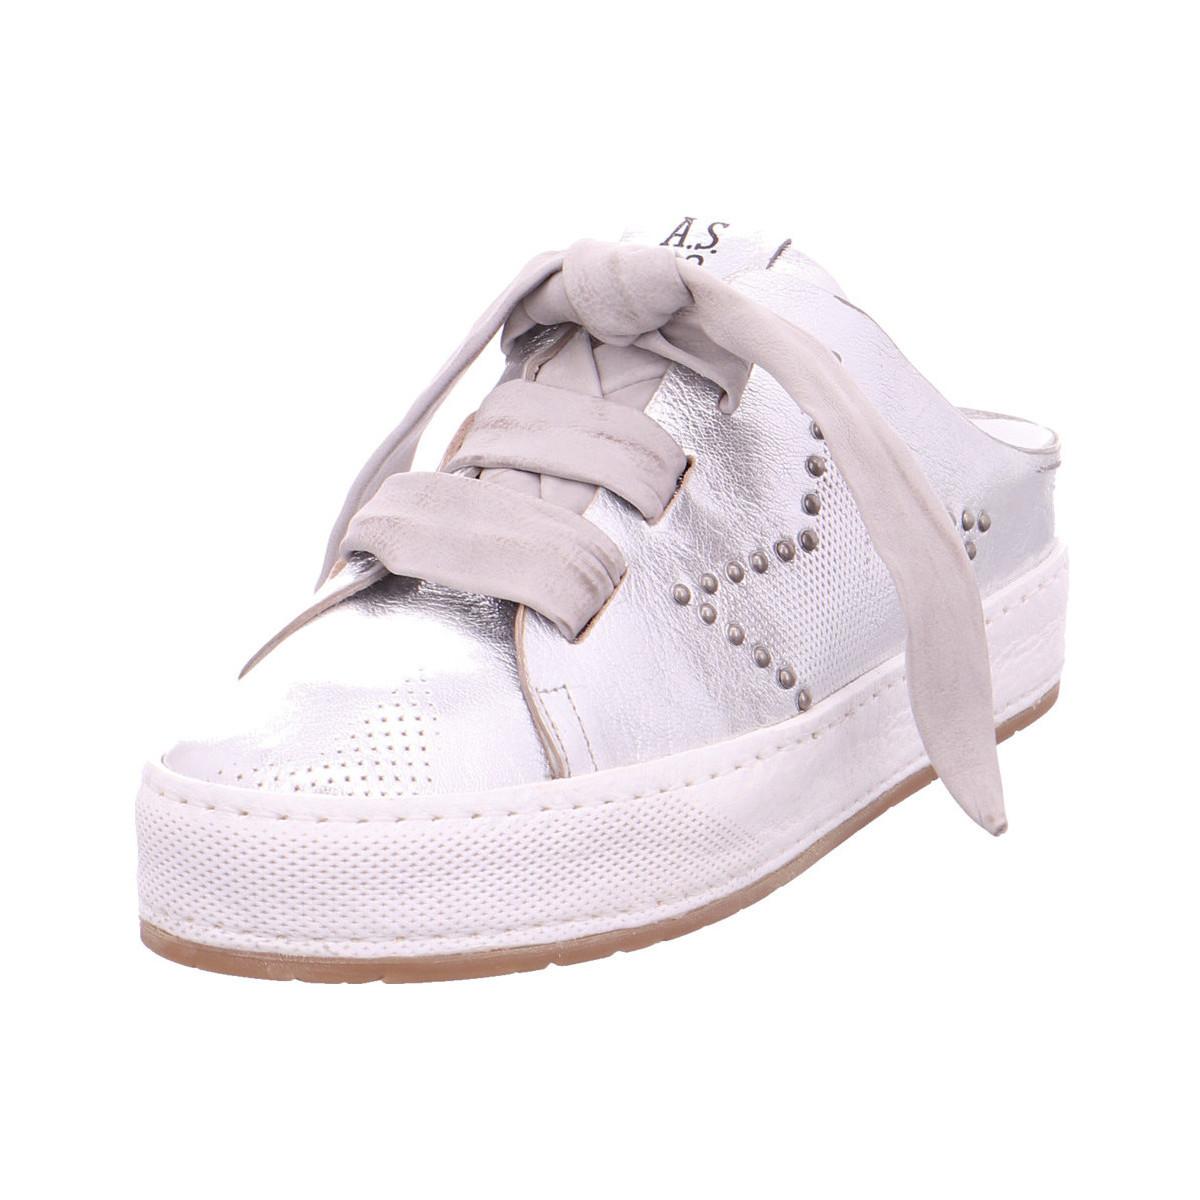 Airstep / AS98 - 852106-0201-0002 Argento/Grigio/White - Schuhe Pantoletten / Clogs Damen 199,95 €